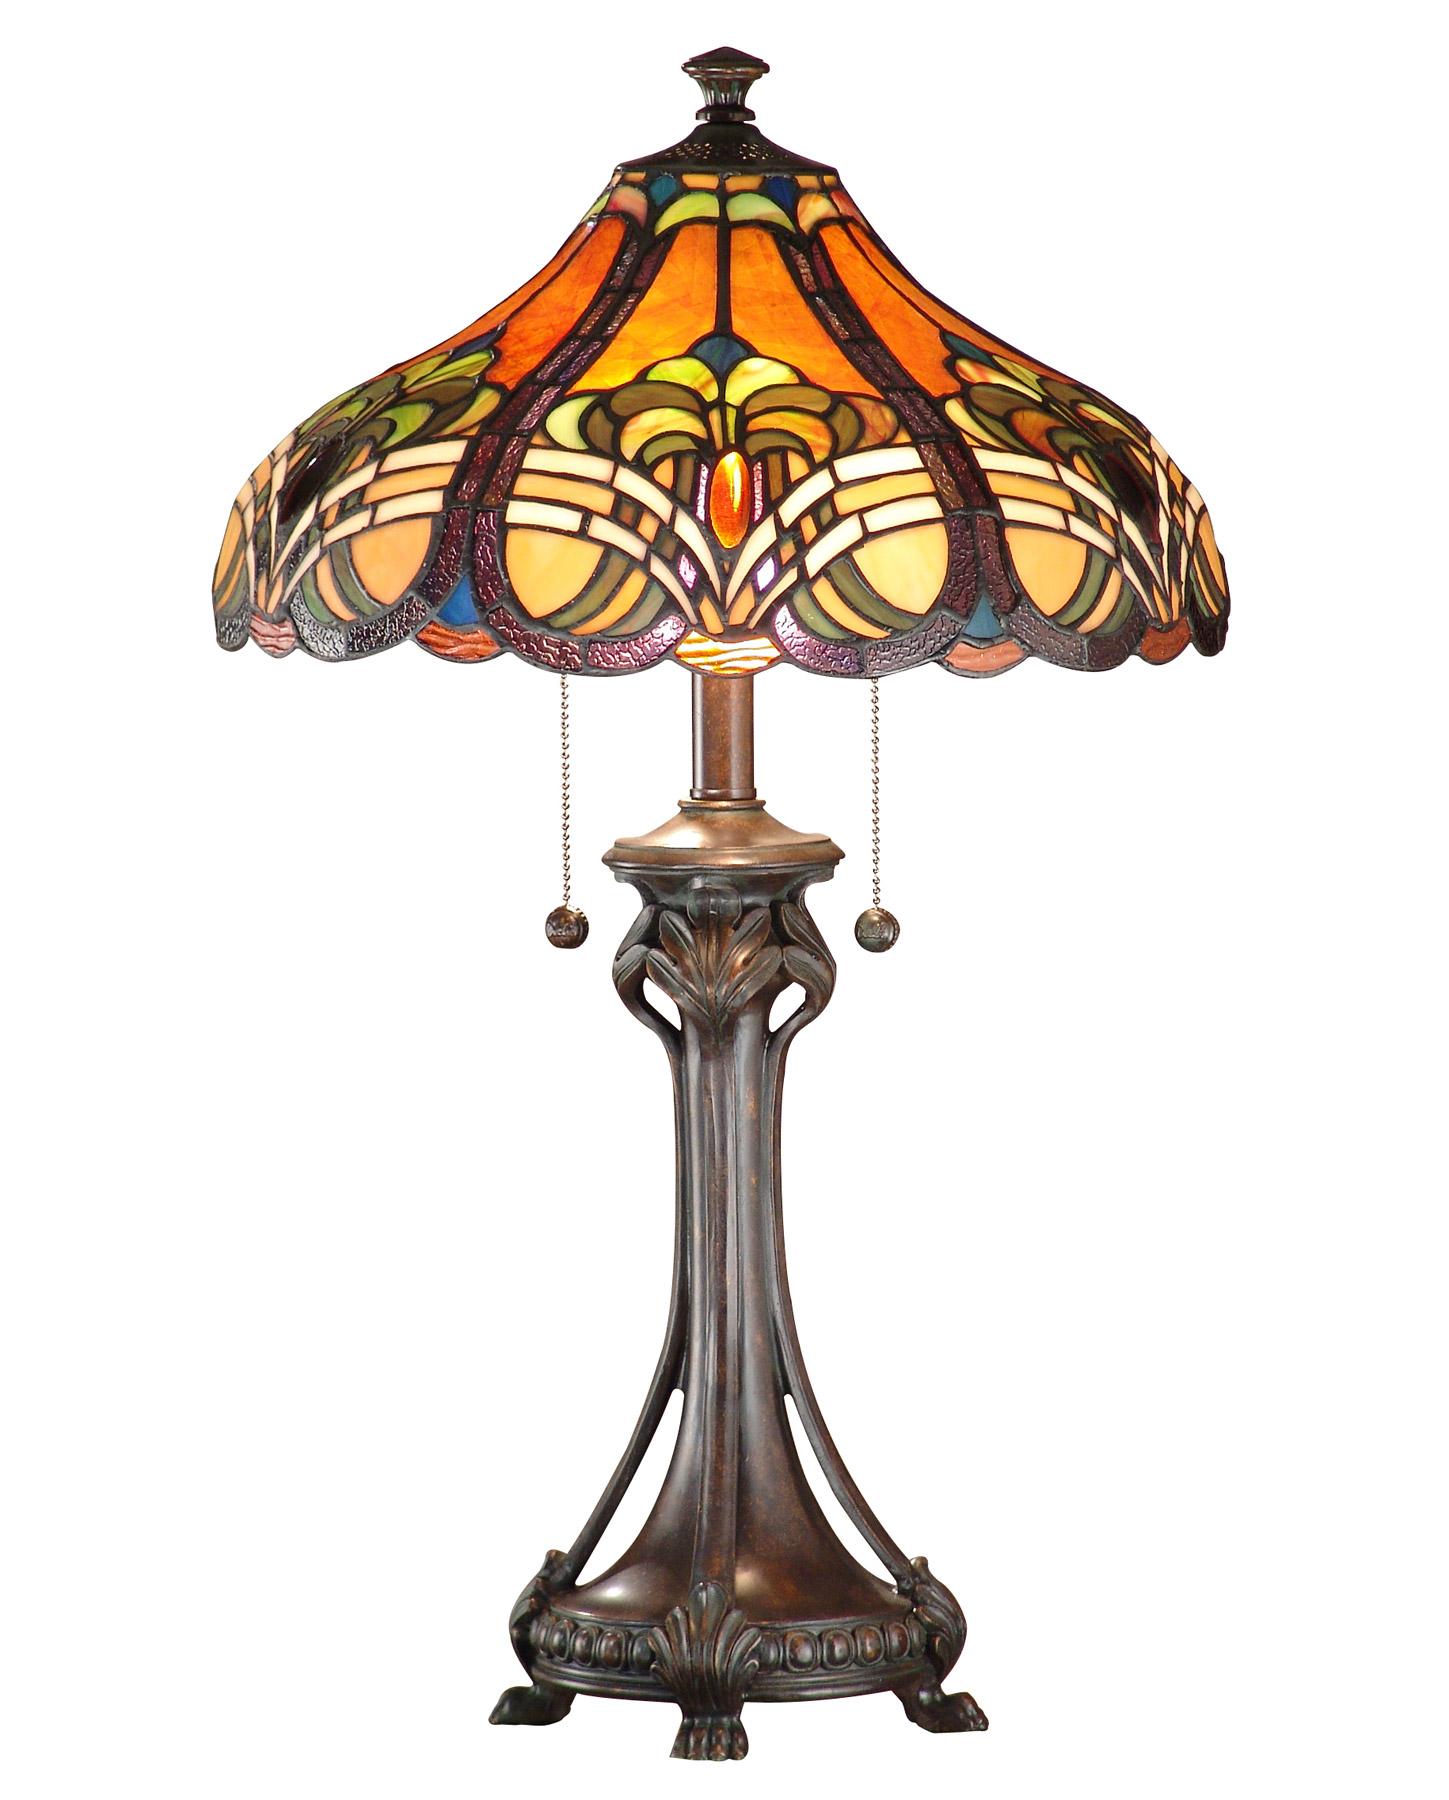 Dale Tiffany Tt101033 Tiffany Bellas Table Lamp